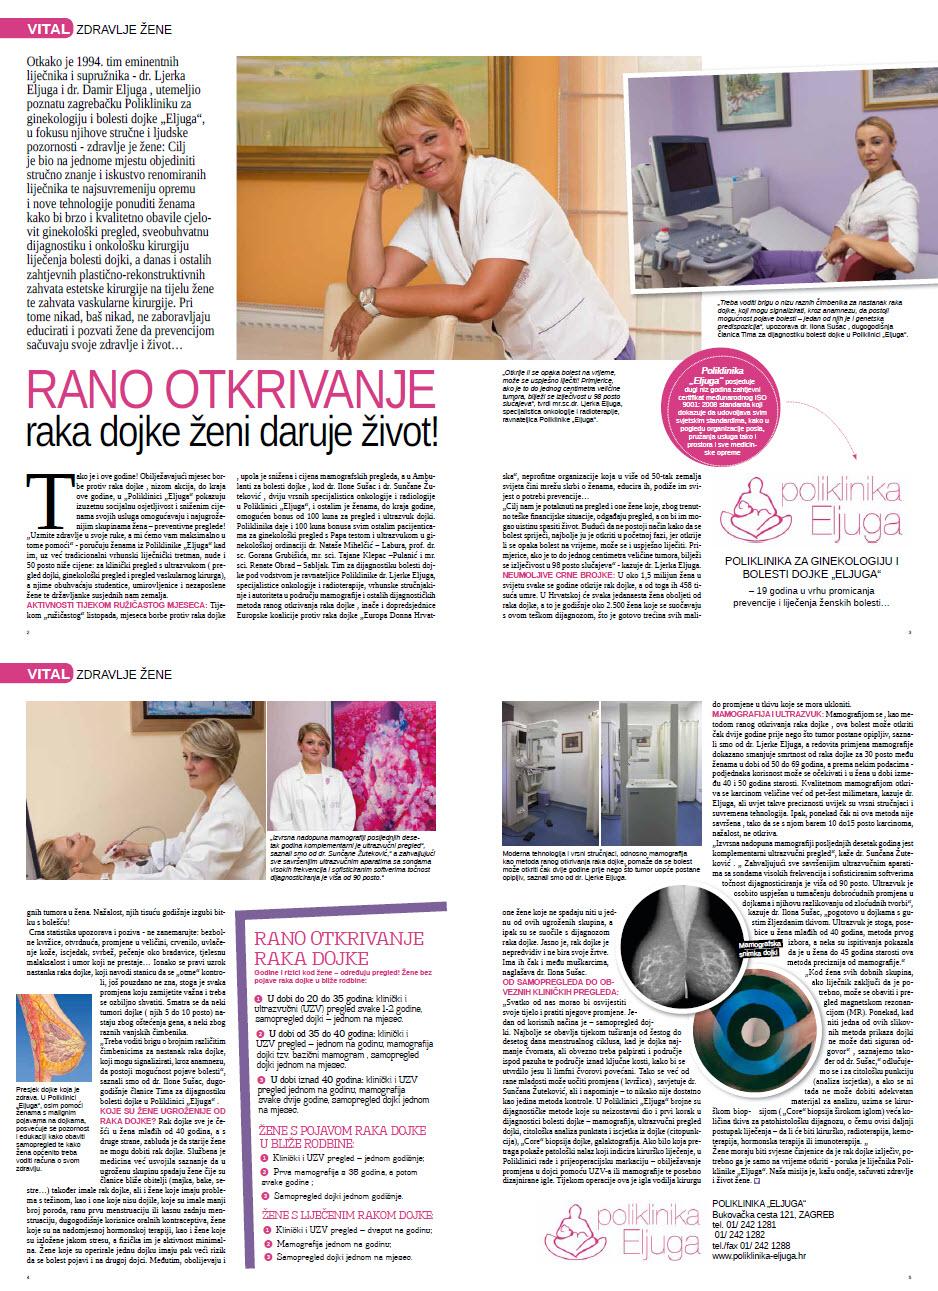 Vital - Rano otkrivanje raka dojke